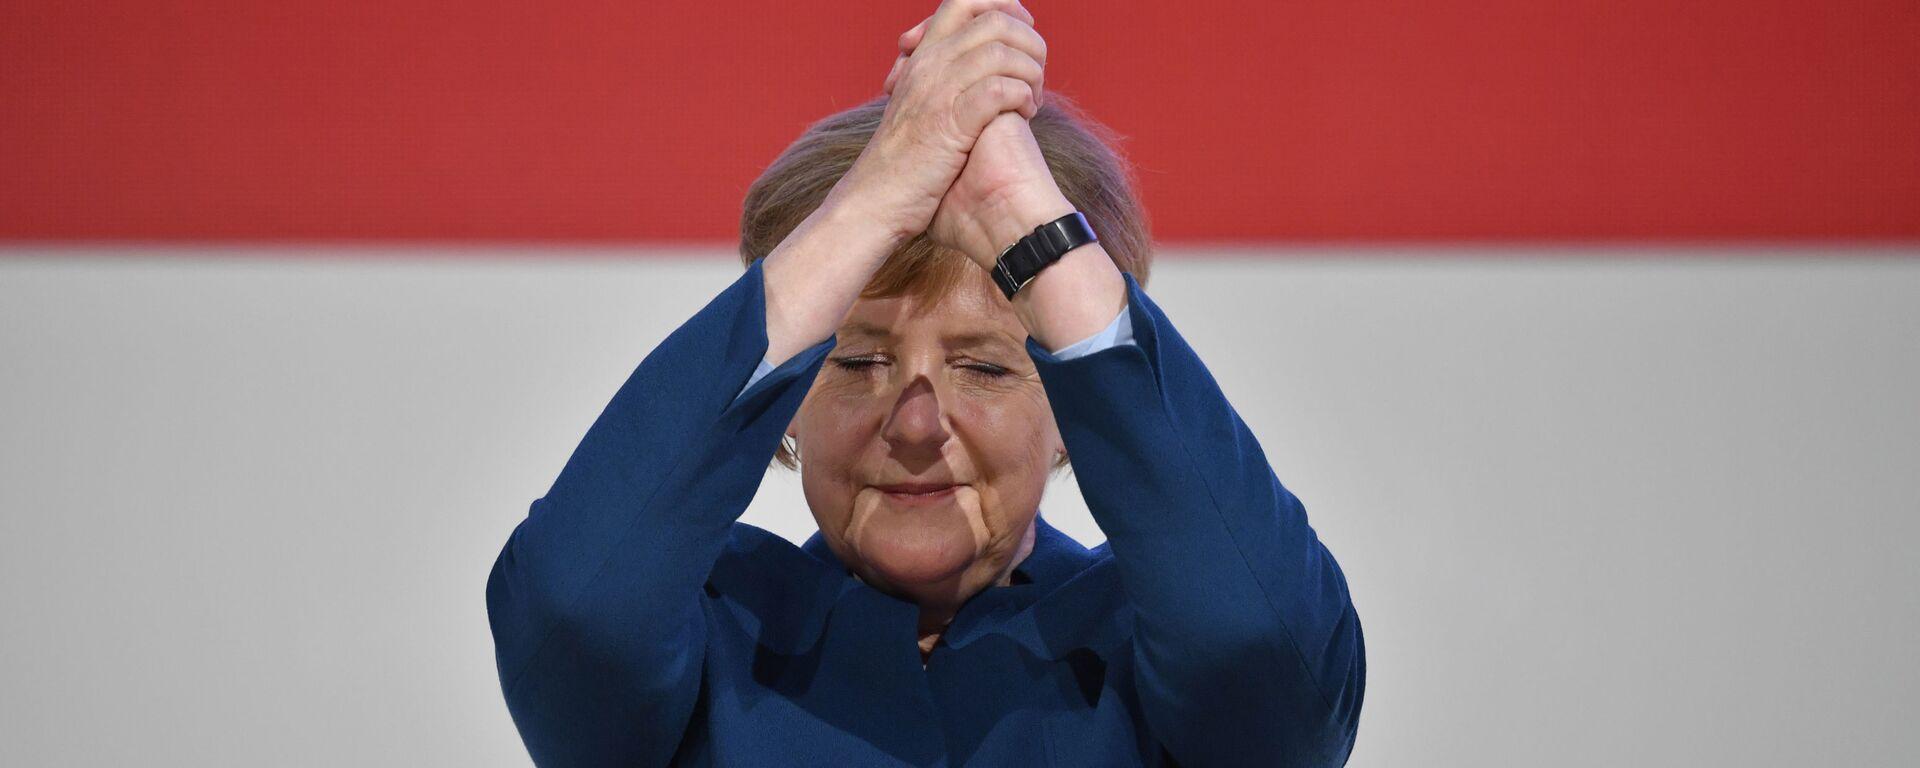 Канцлер Германии Ангела Меркель  - Sputnik Таджикистан, 1920, 06.04.2021